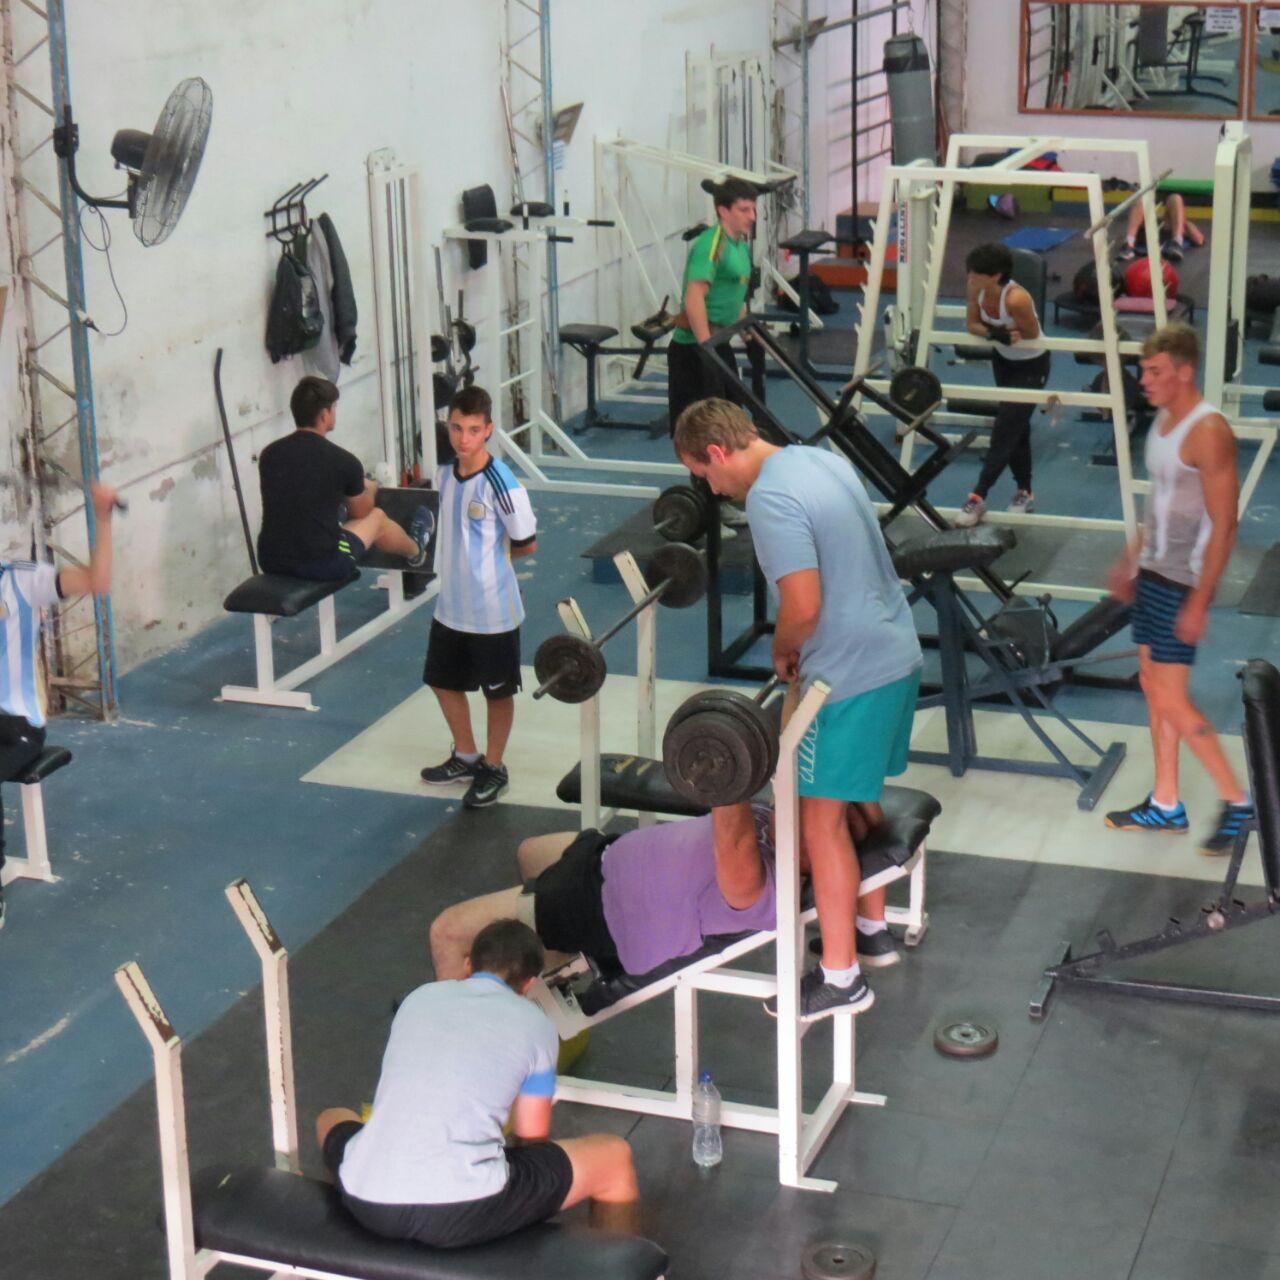 Darregueira noticias bulls gym la mejor forma de entrenar for Gimnasio gym forma